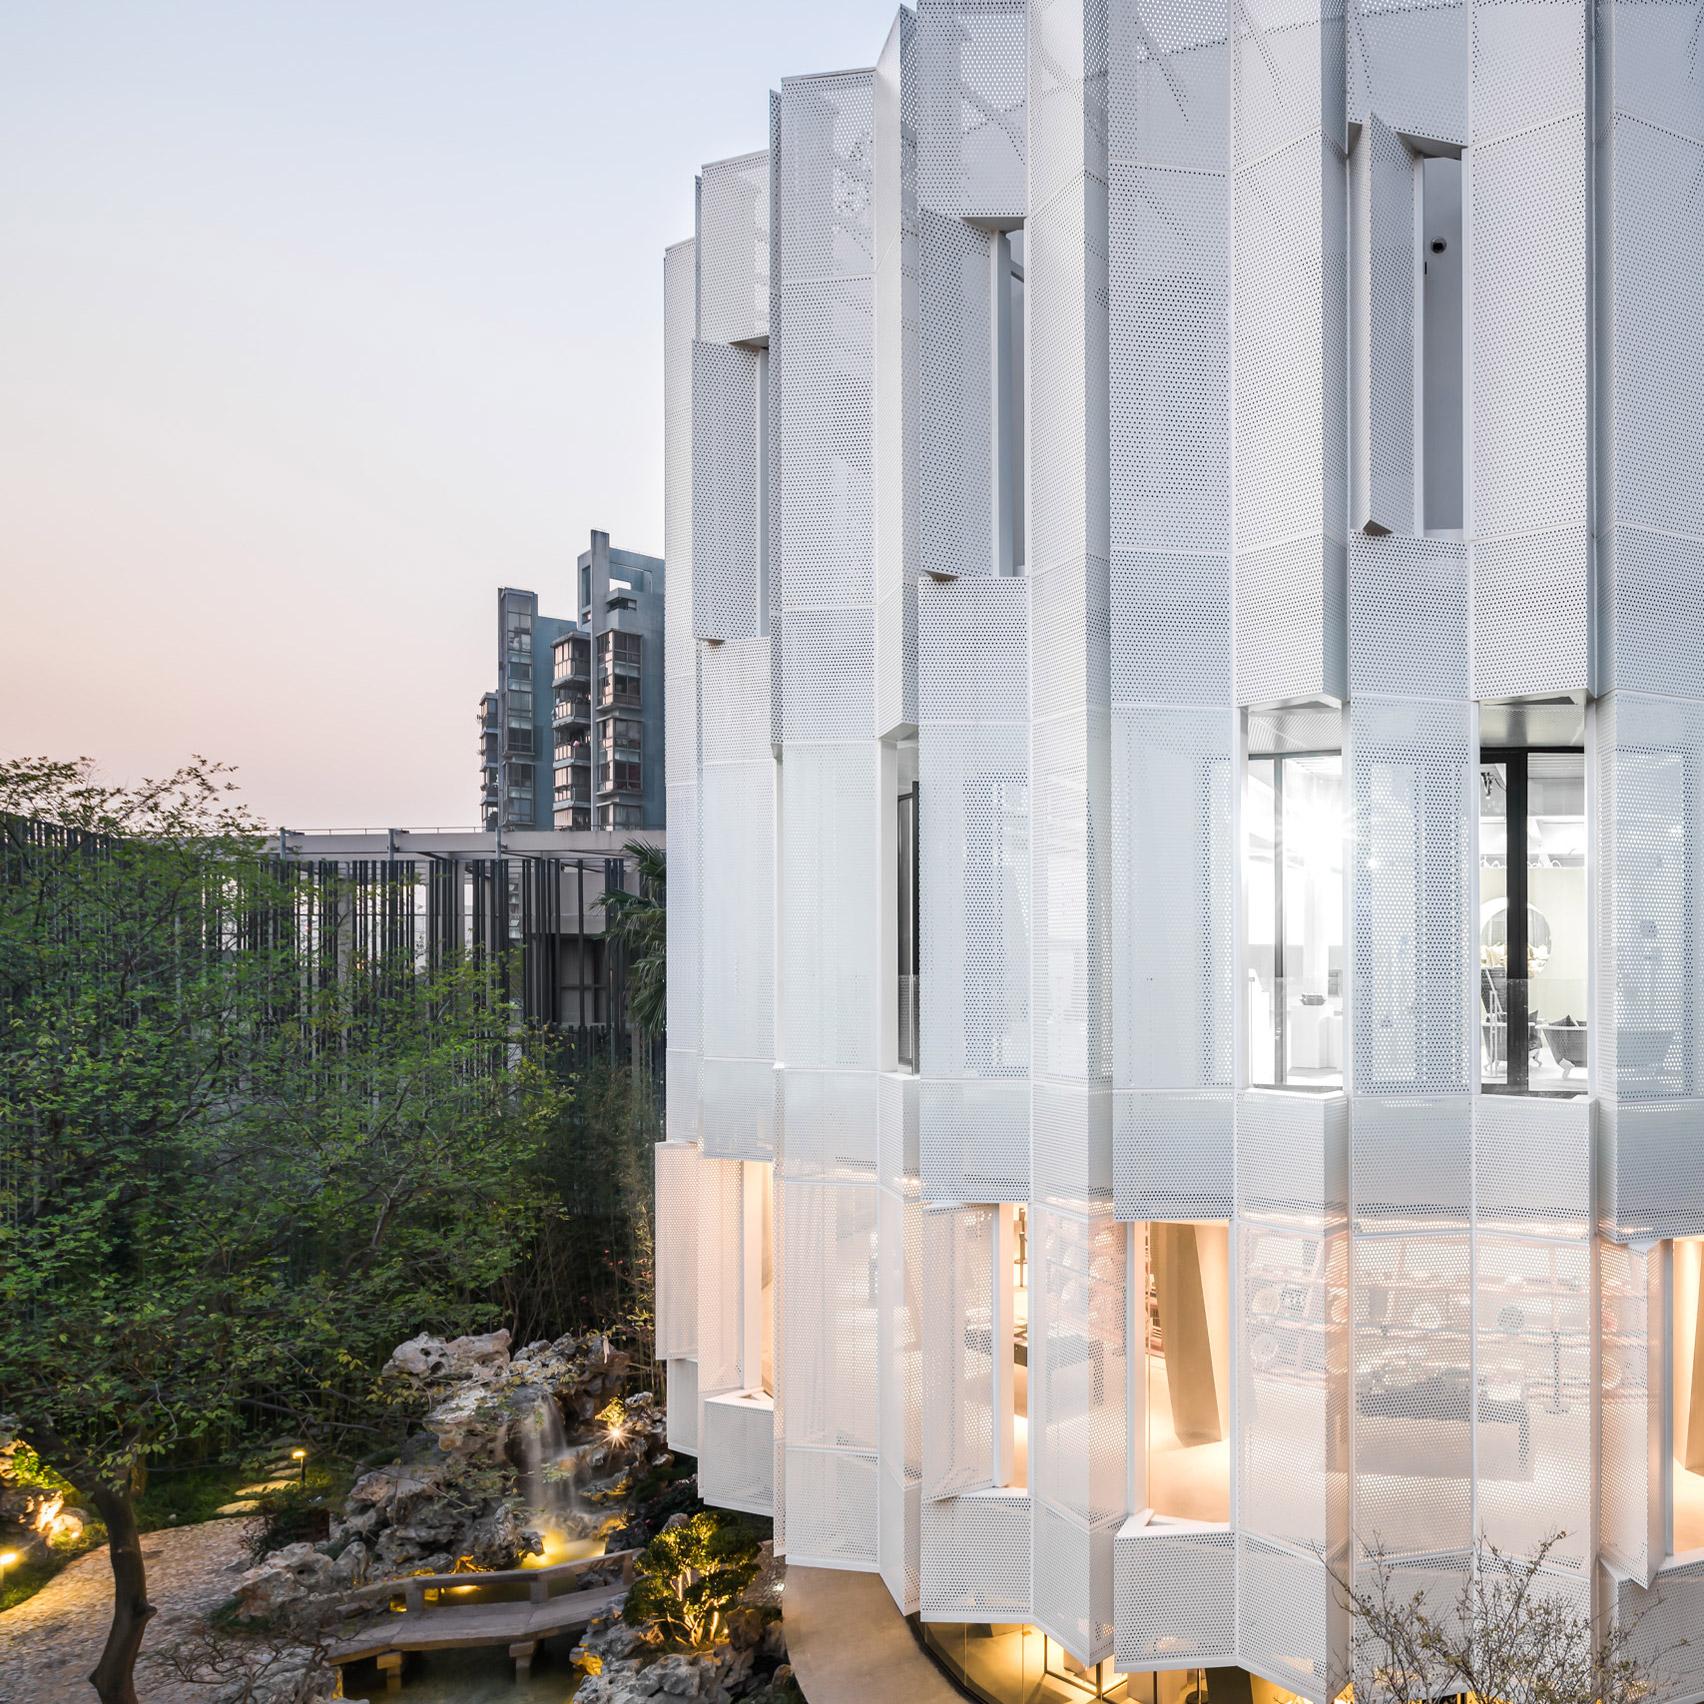 Buildings with perforated metal facades | Dezeen